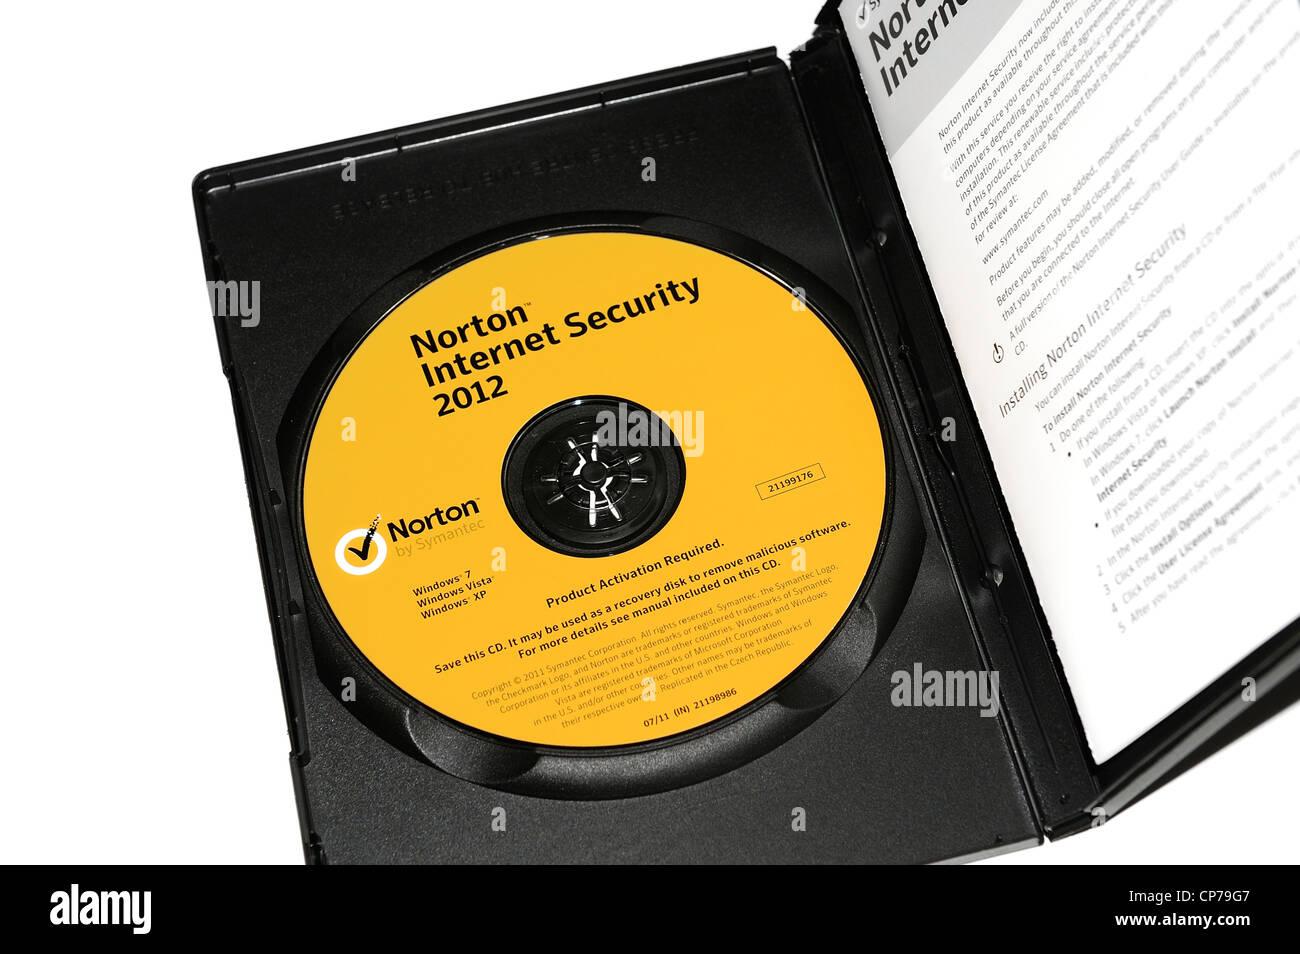 Norton 360 Mobile Security